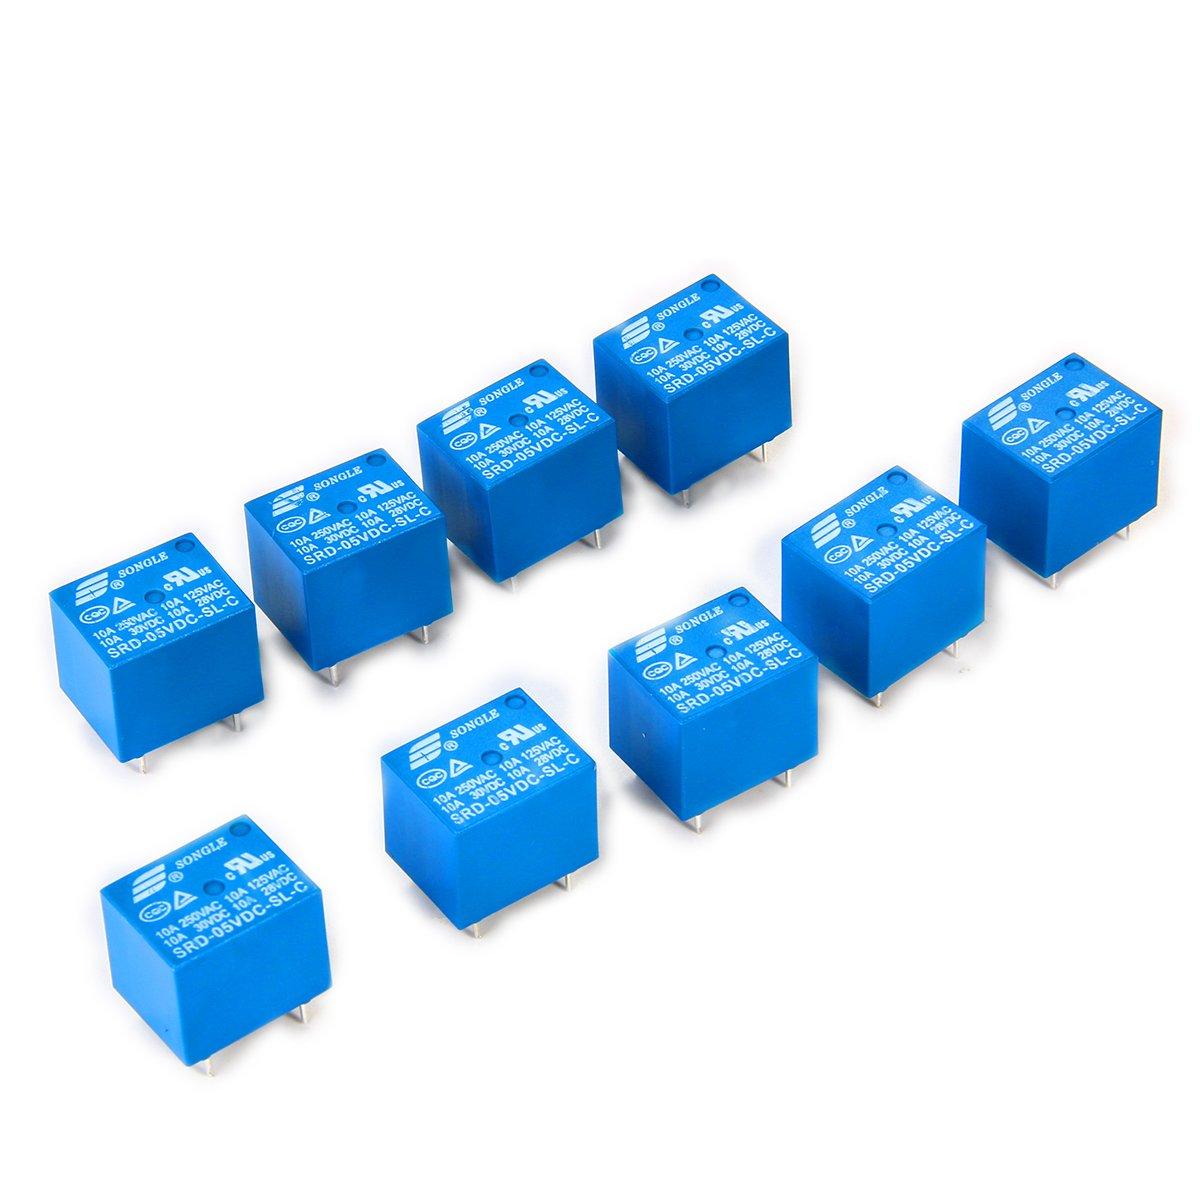 Pin para PCB SONGLE rel/é Electromagn/ético de Alimentaci/ón SPDT 12V 10A Montaje 10 Unidades Control Aplicaciones Electrodom/ésticos BI084